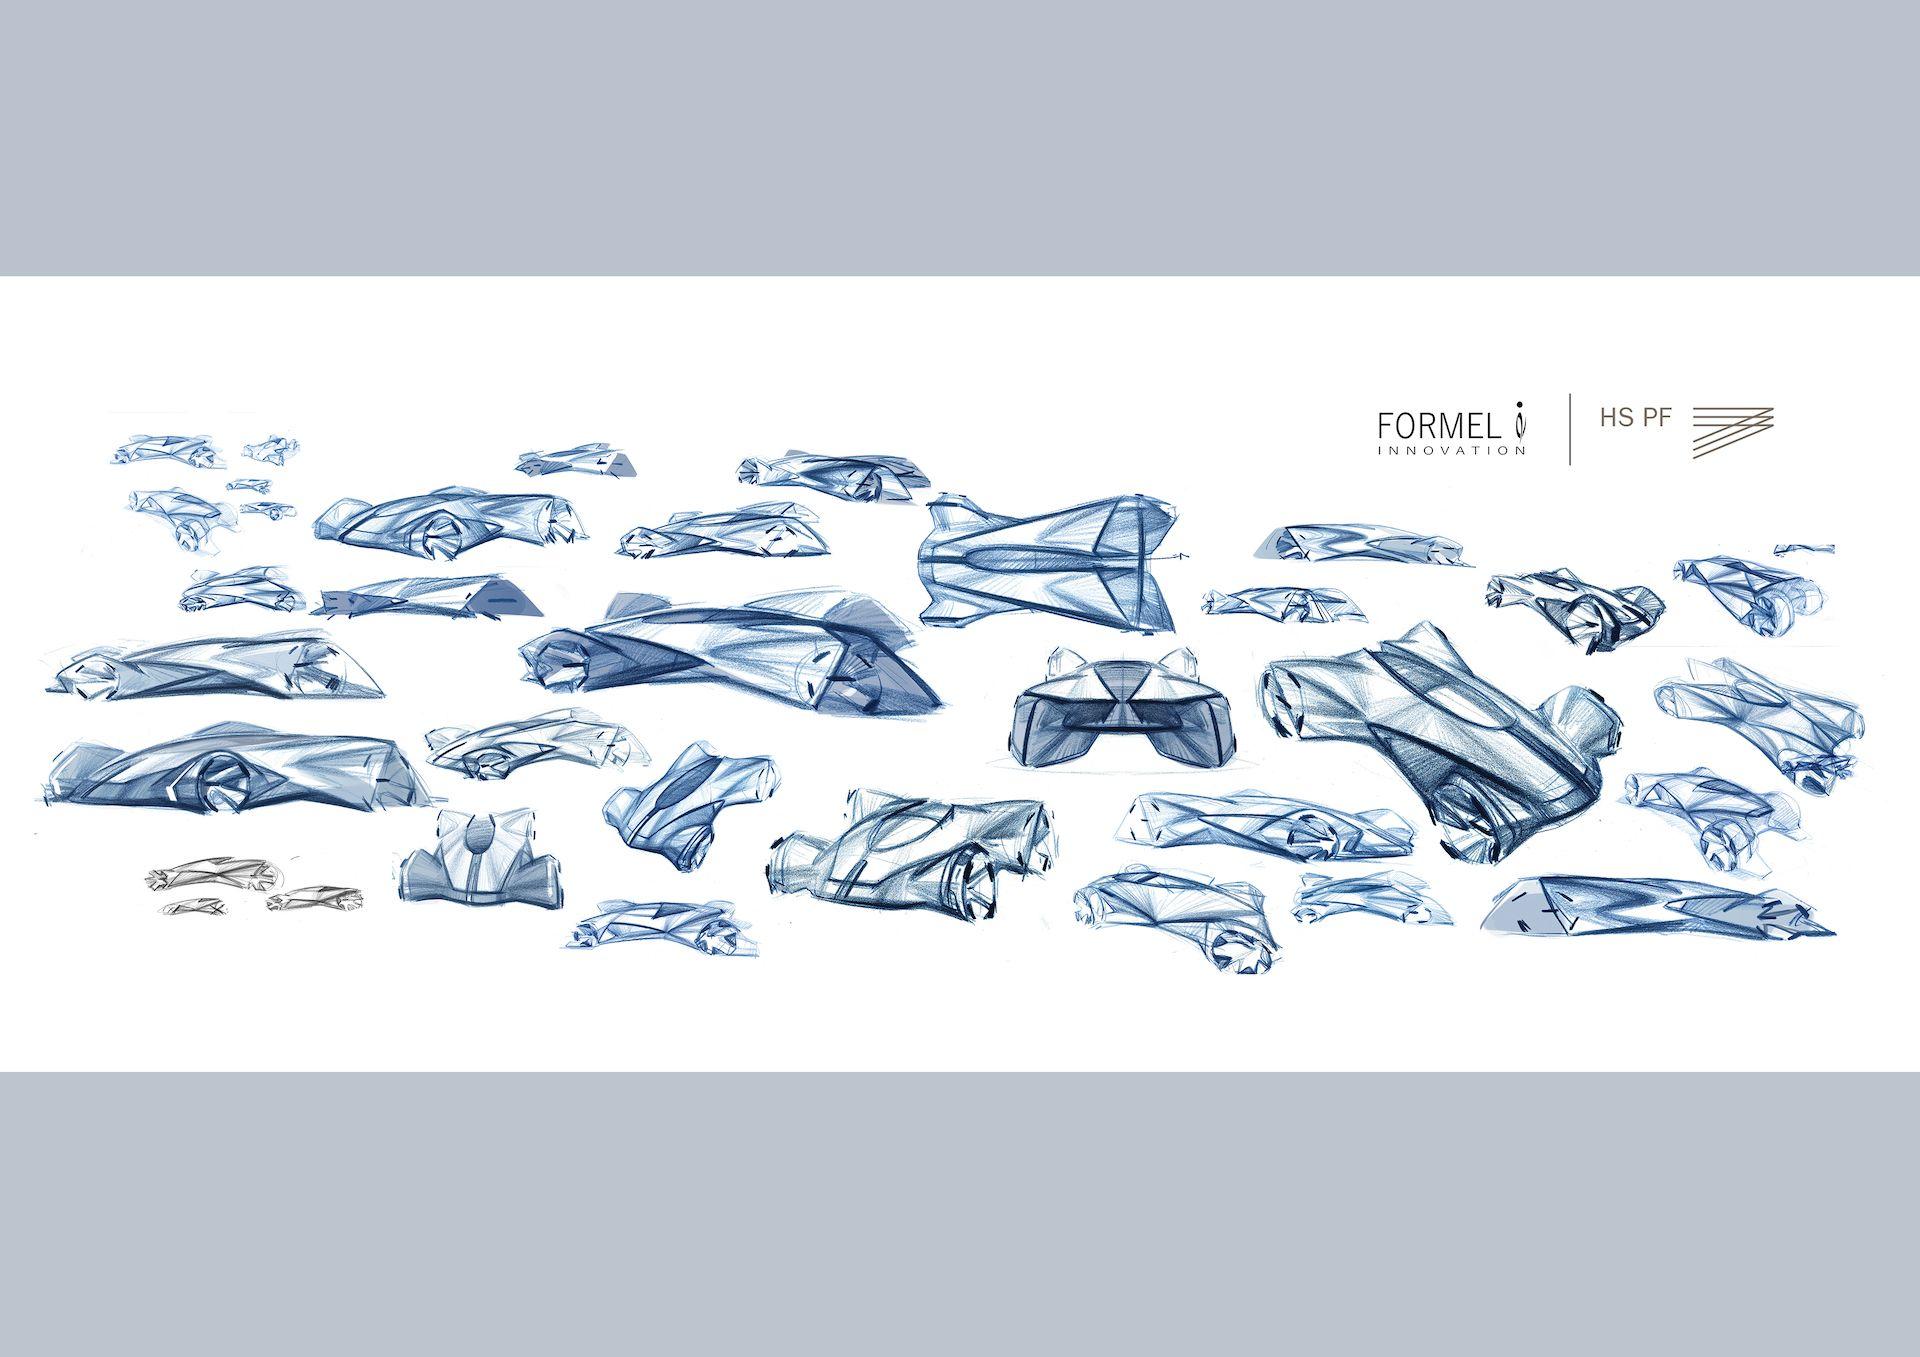 Matd1 Xuanming Xu Car Design News Creating A Portfolio Automotive Design Car Design